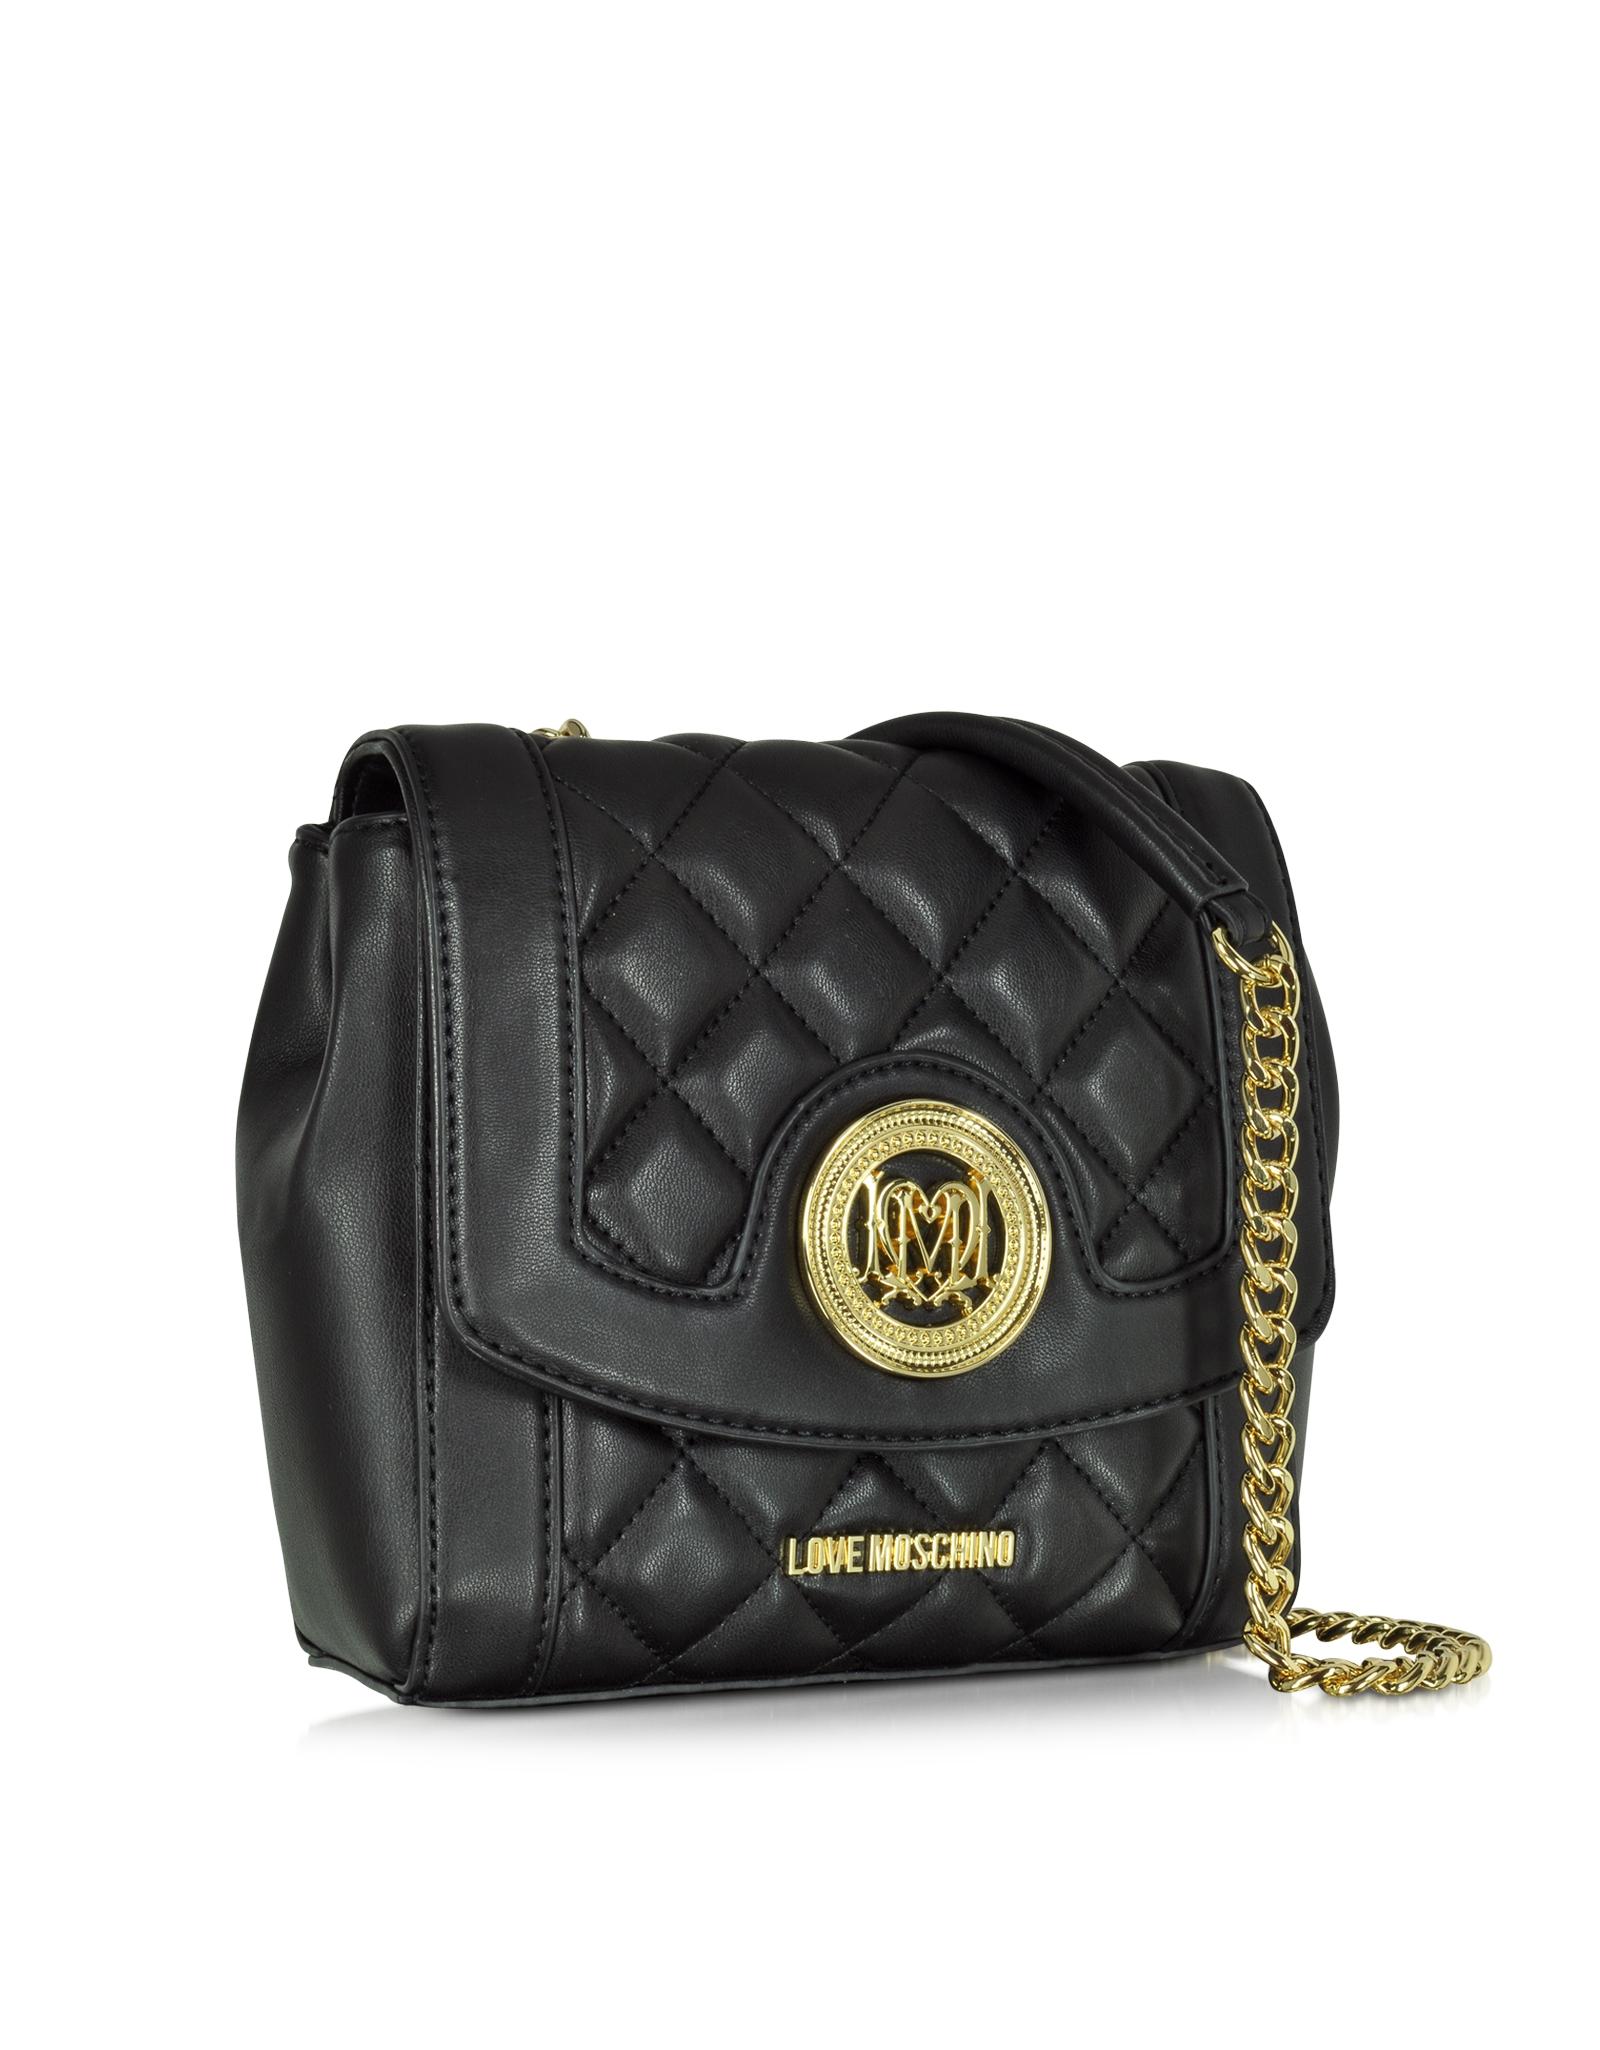 Moschino Medium Leather Shoulder Bag clFSFvl